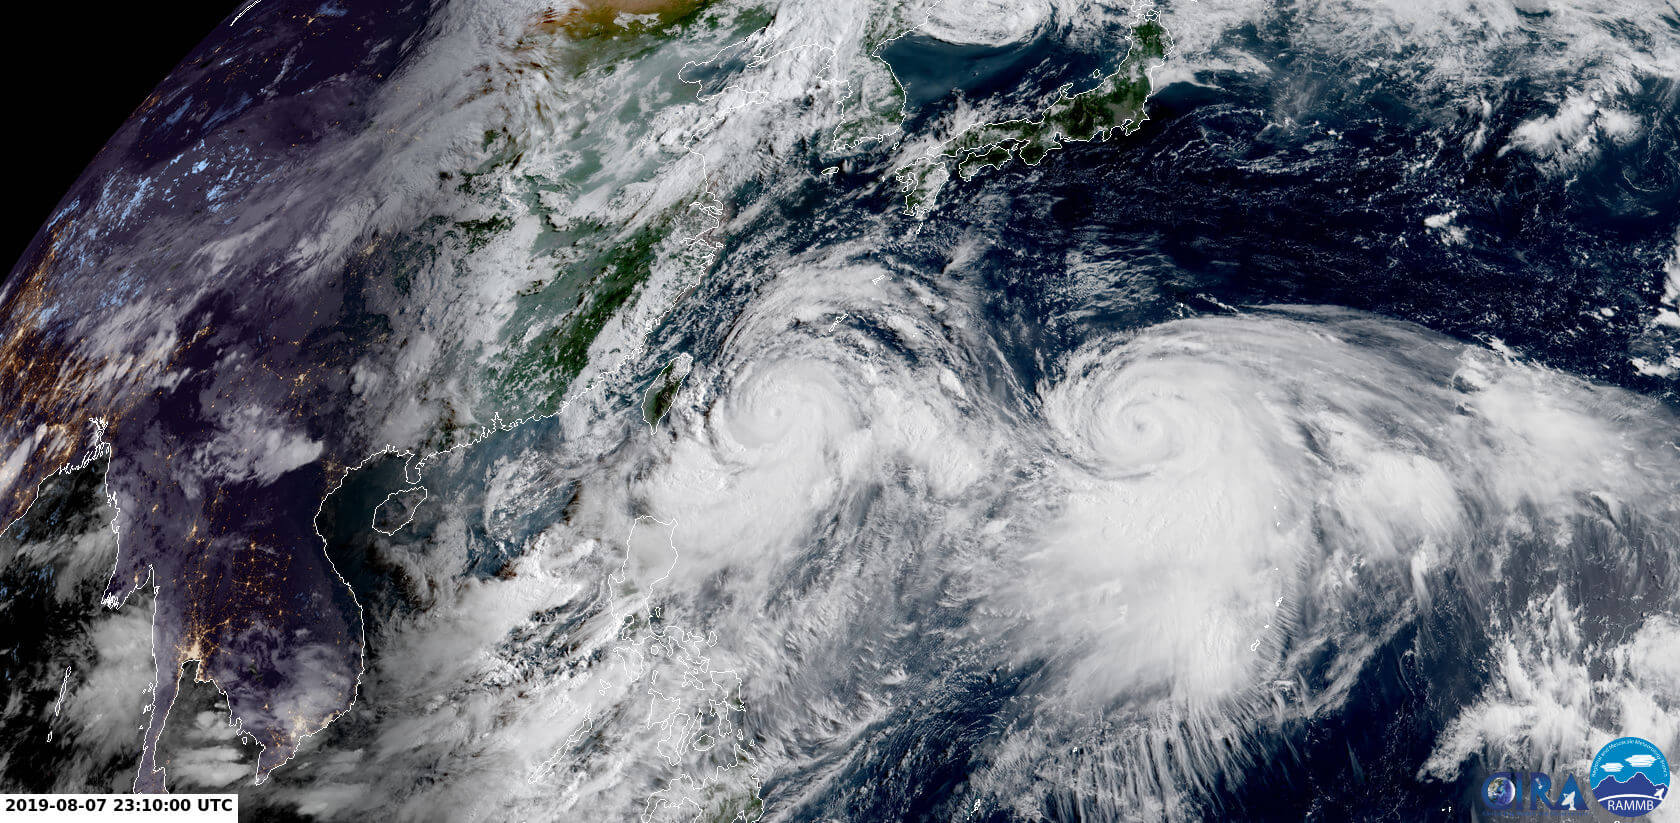 Himawari-Satellitenbild am 08.08.2019 um 01:10 Uhr MESZ © CIRA - RAMMB http://rammb-slider.cira.colostate.edu